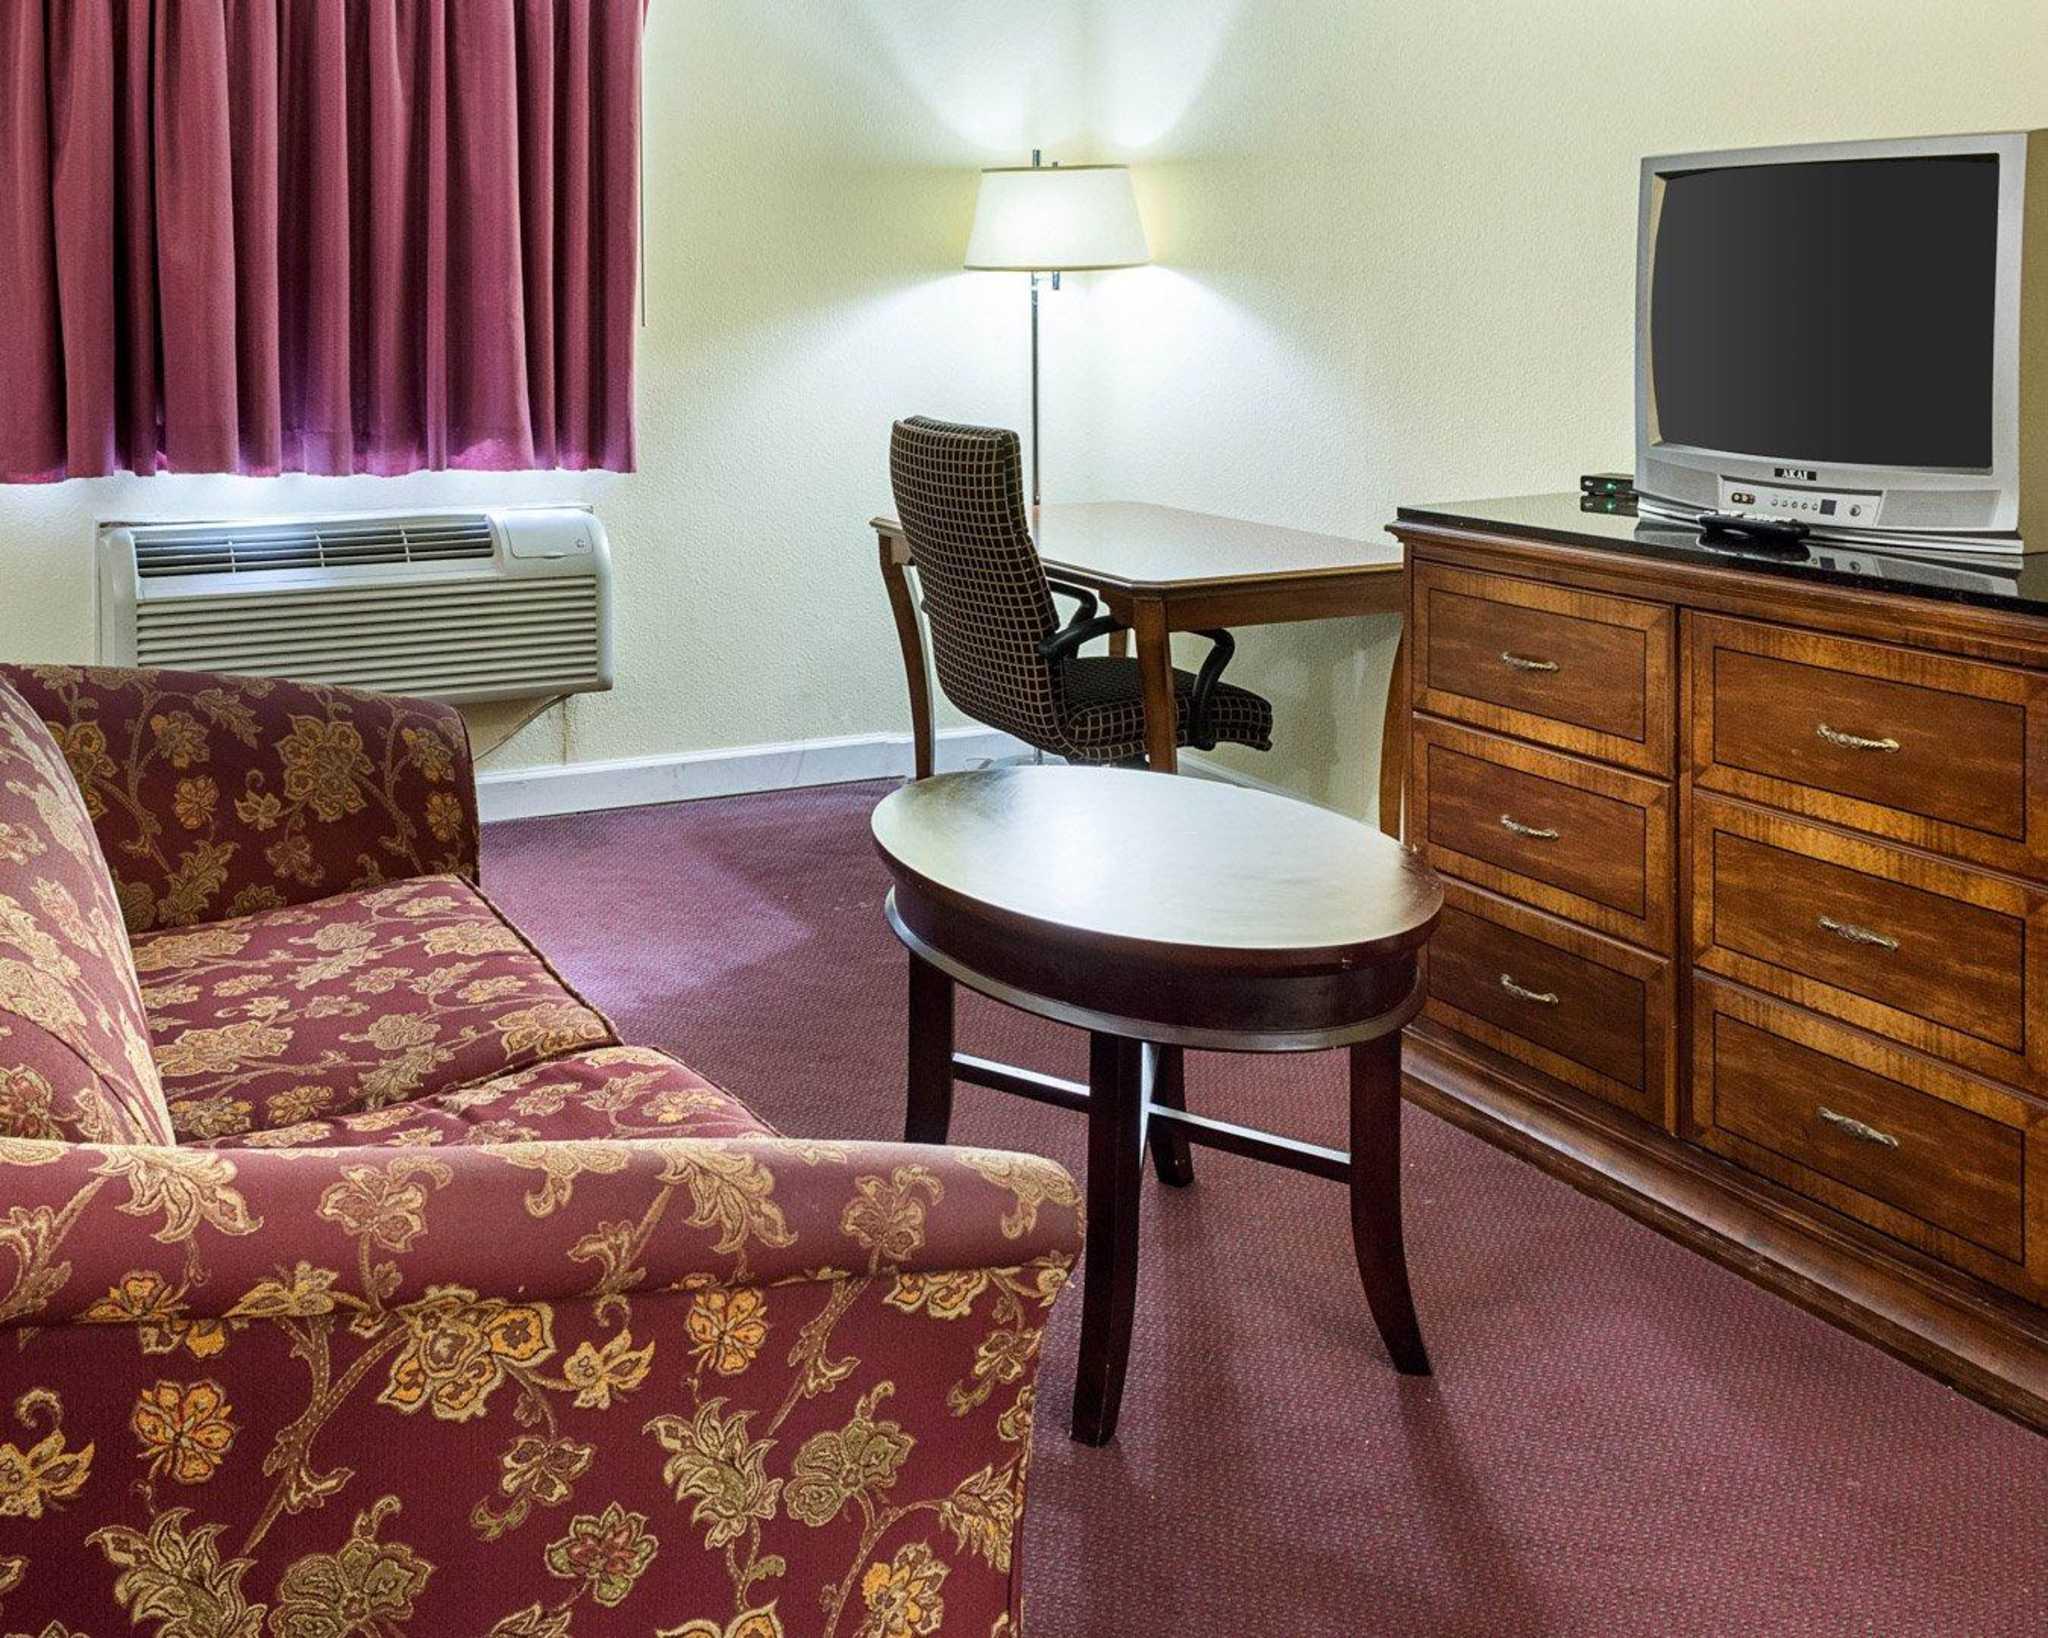 Econo Lodge Inn & Suites Carrollton Smithfield image 21